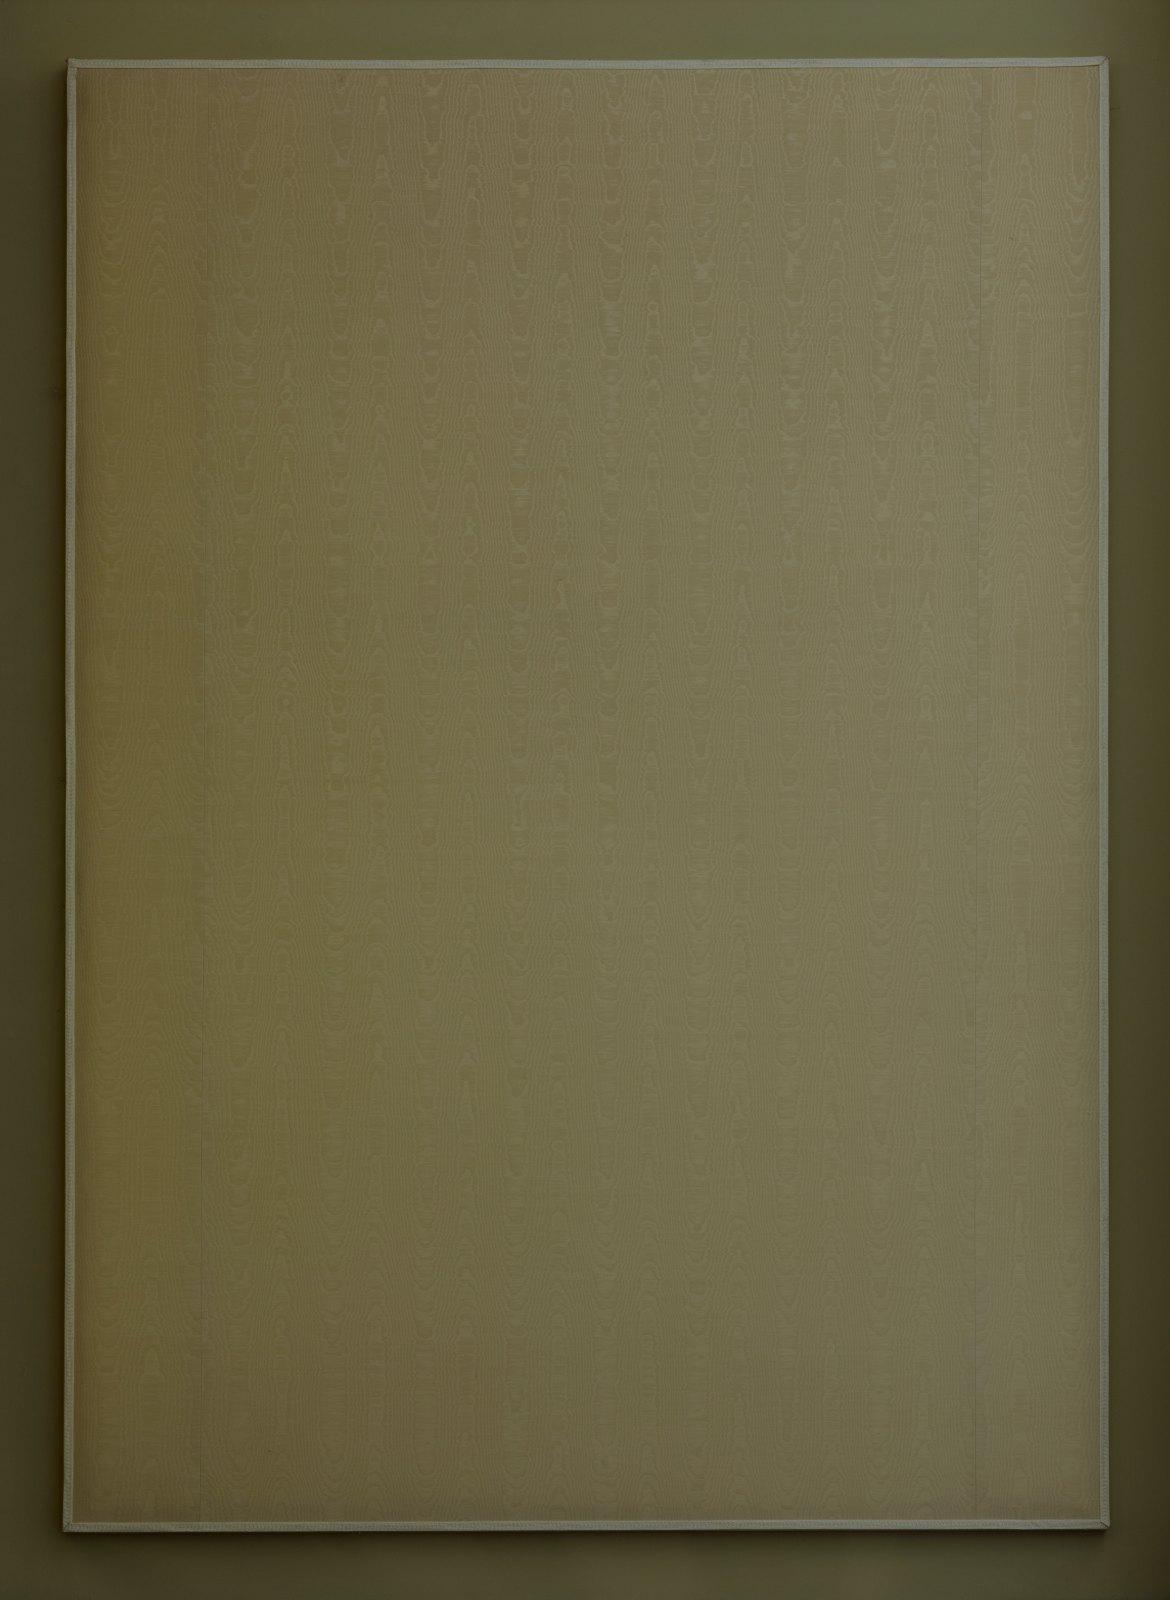 Acoustic muffler, Supreme Court, 2010, giclée print, aluminium, 167,3 x 124,3 cm